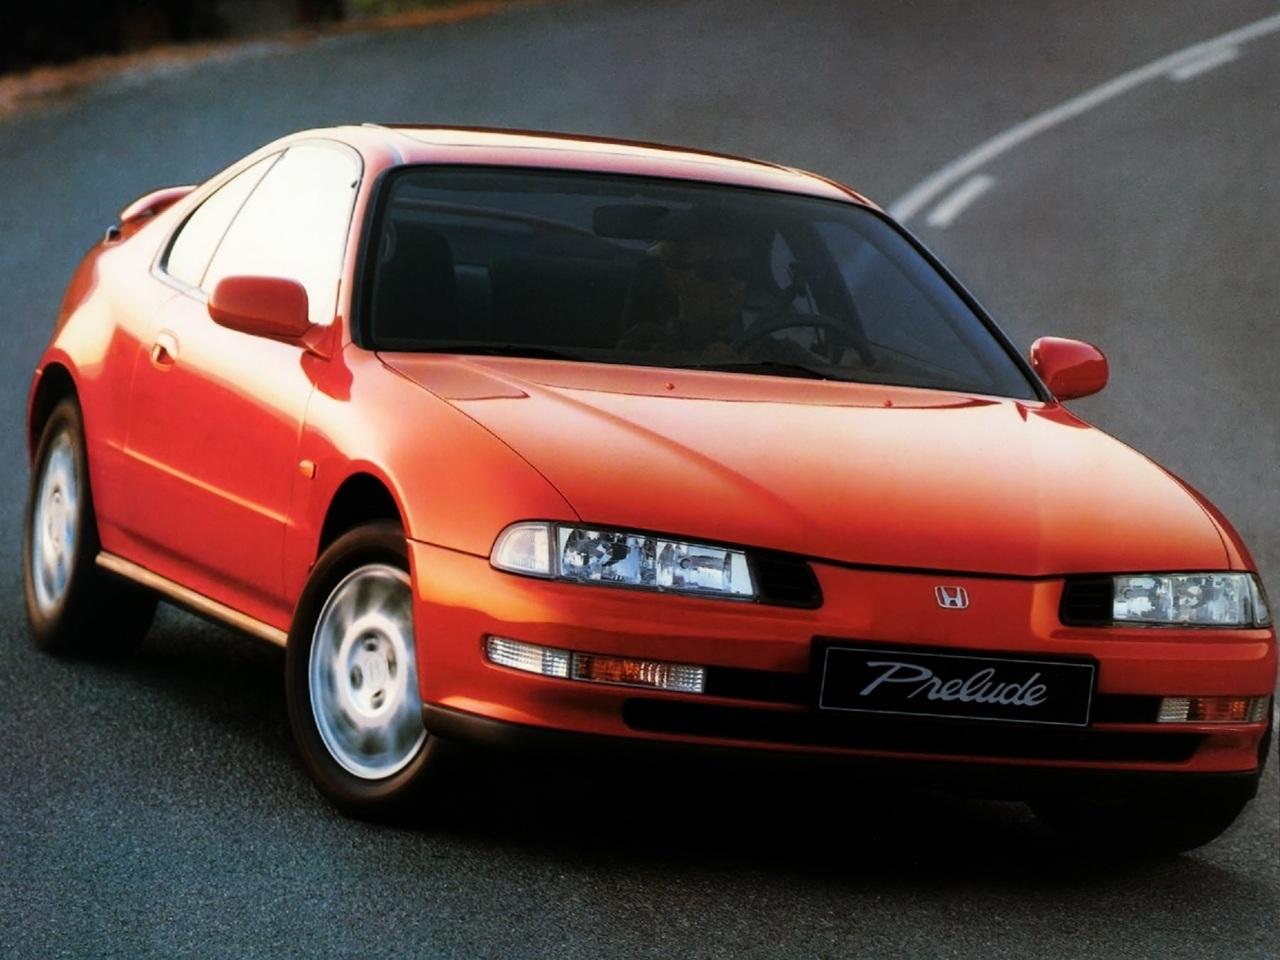 2021 Honda Prelude Release Date